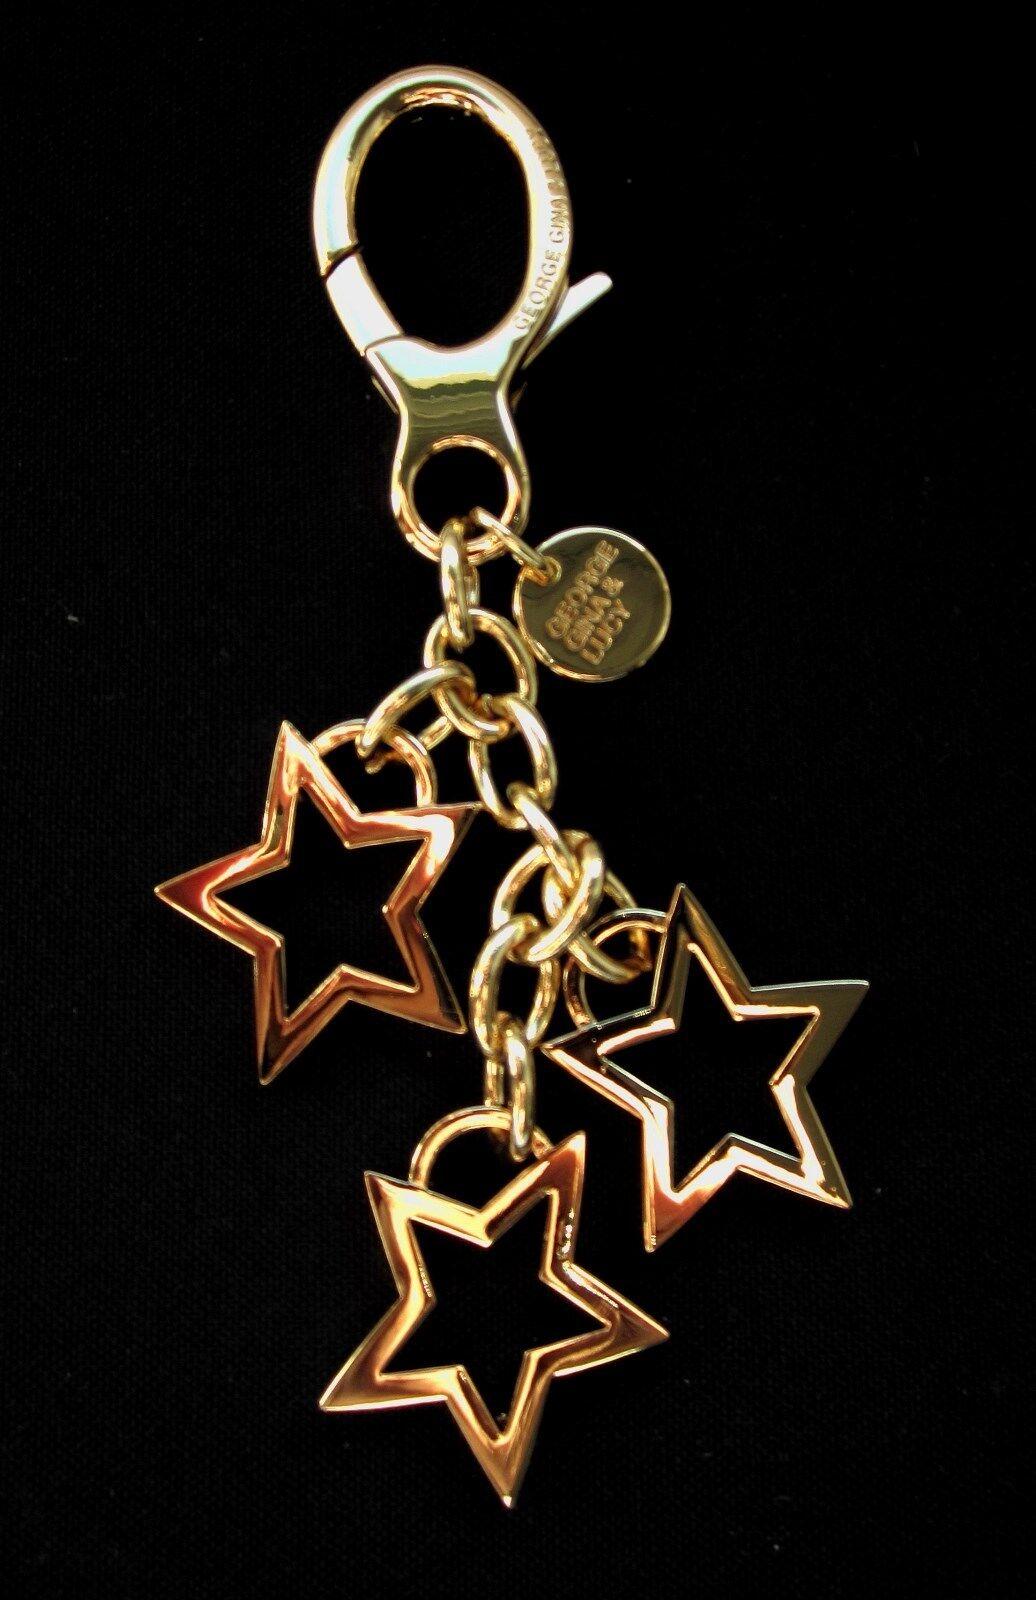 NEU George Gina Gina Gina Lucy Schlüsselring Sterne Keyrings KEY2stars Gold   Feinbearbeitung    Neu    Erste in seiner Klasse  6a42e7